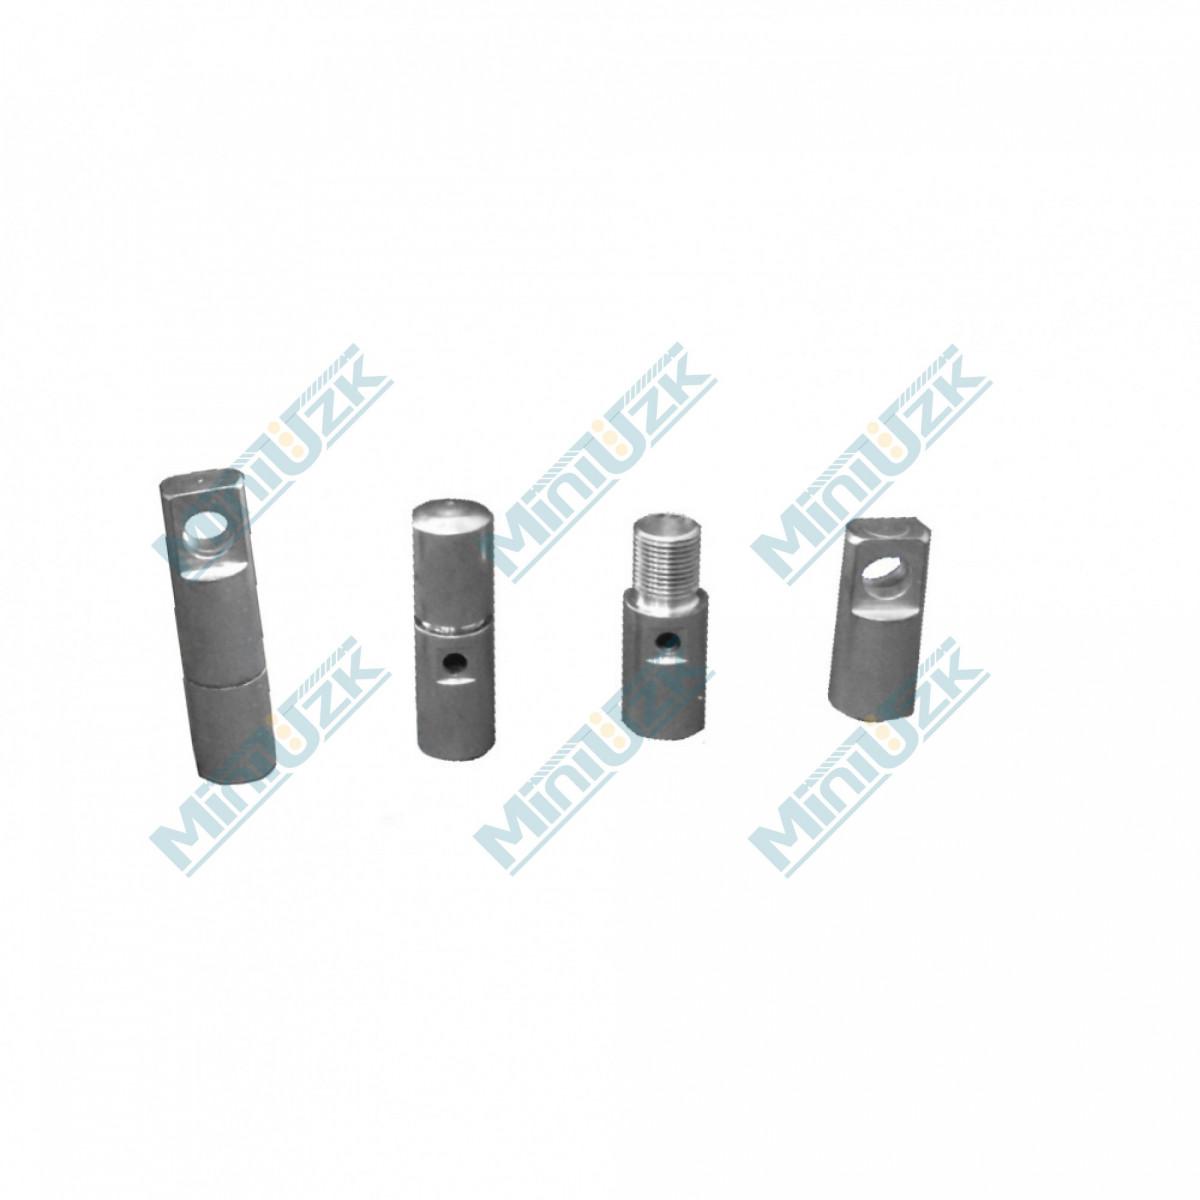 Устройство закладки кабеля (УЗК) OlmiOn СП-Т1-9/250